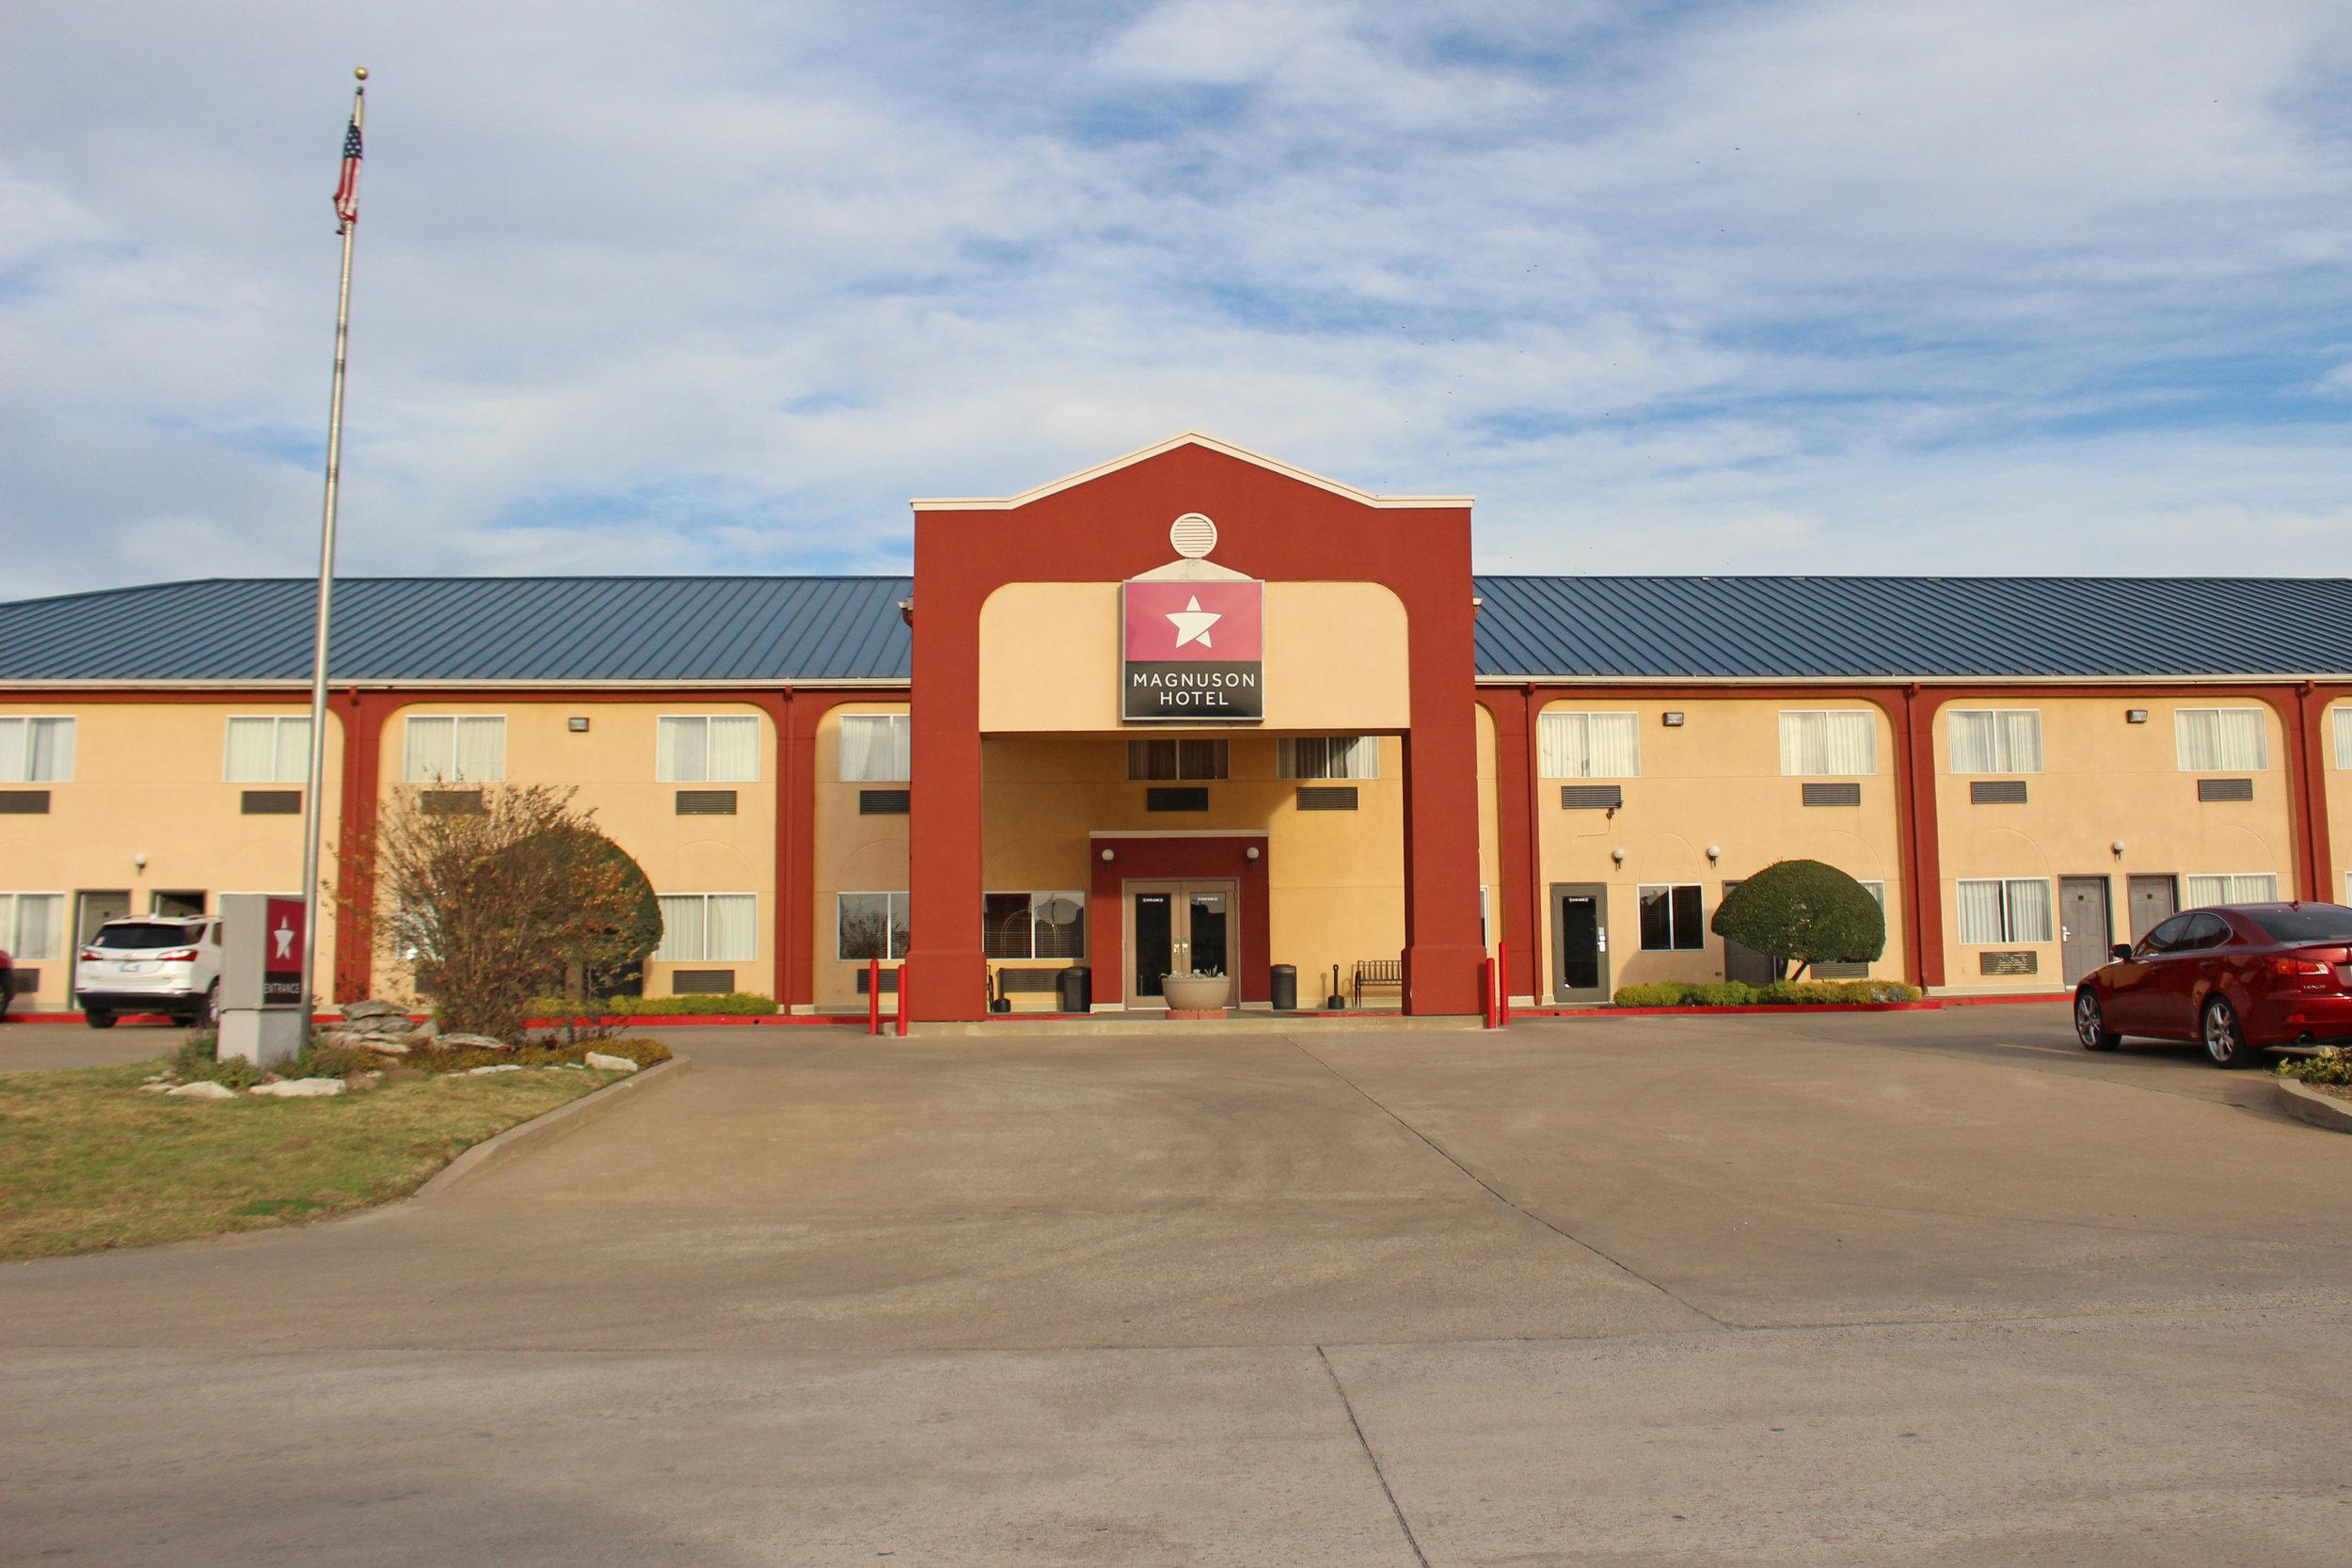 magnuson hotel 211 south lake drive